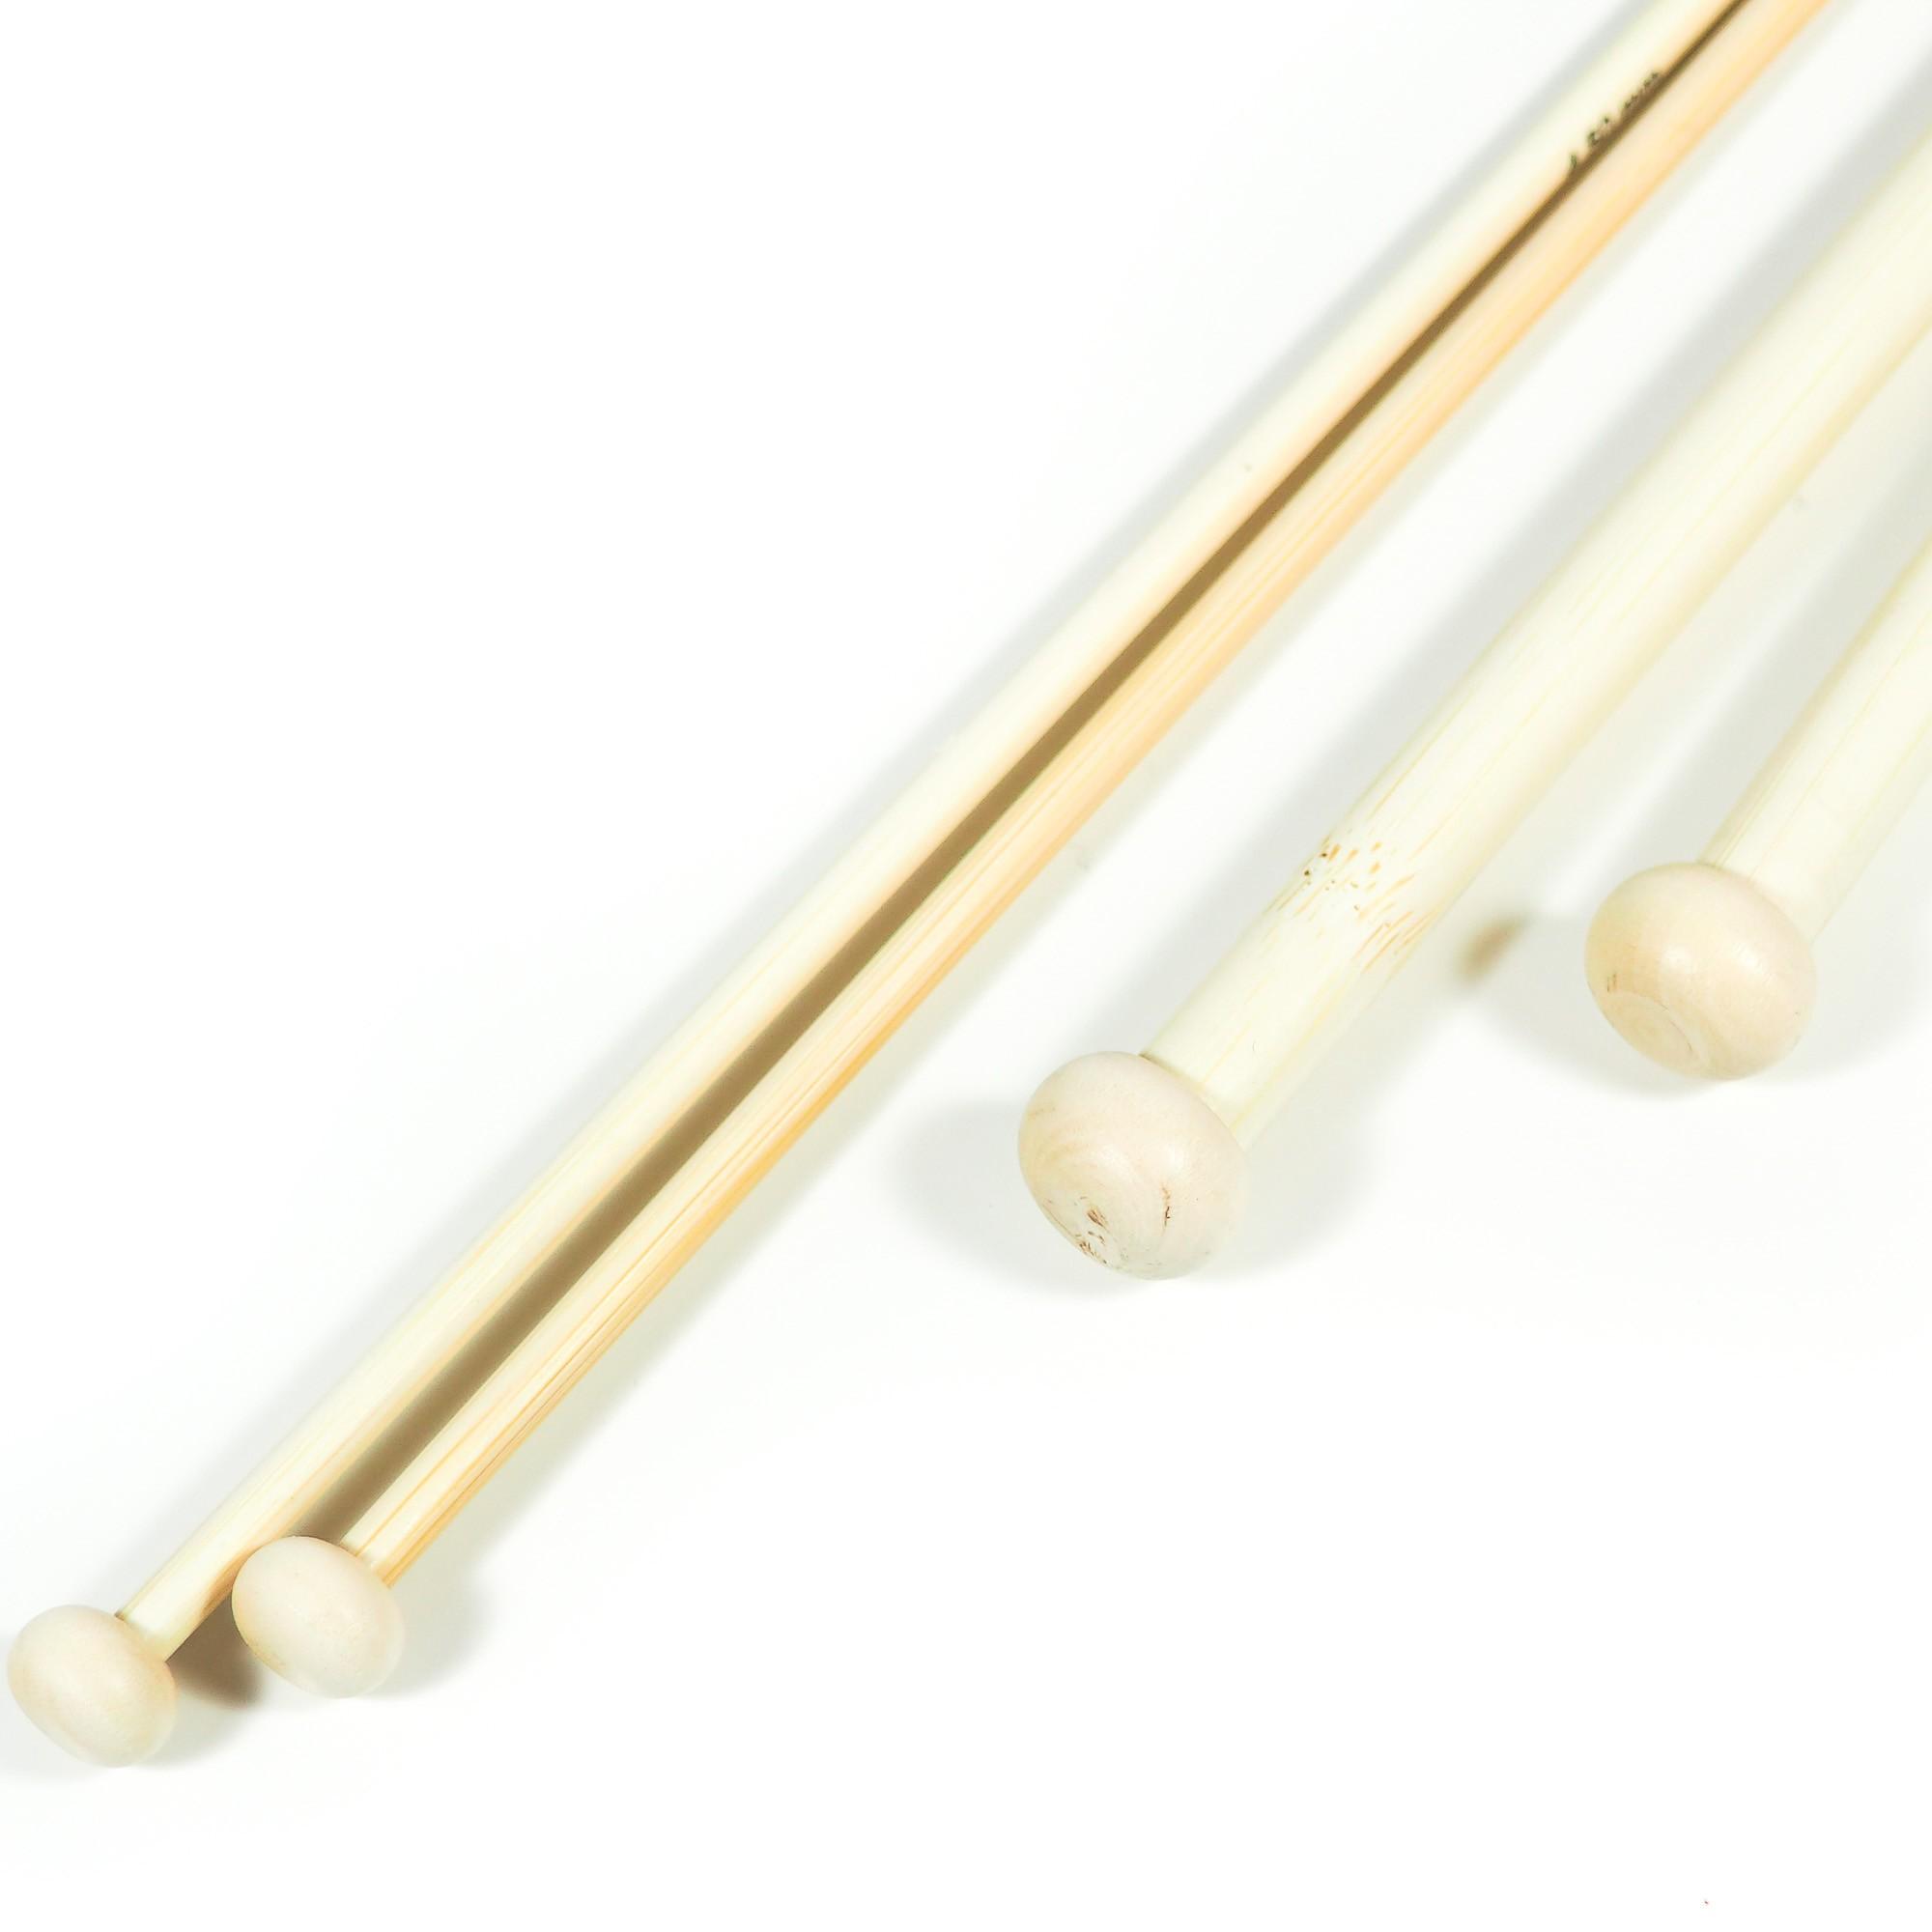 Classic Knitting Needles Bamboo 33cm